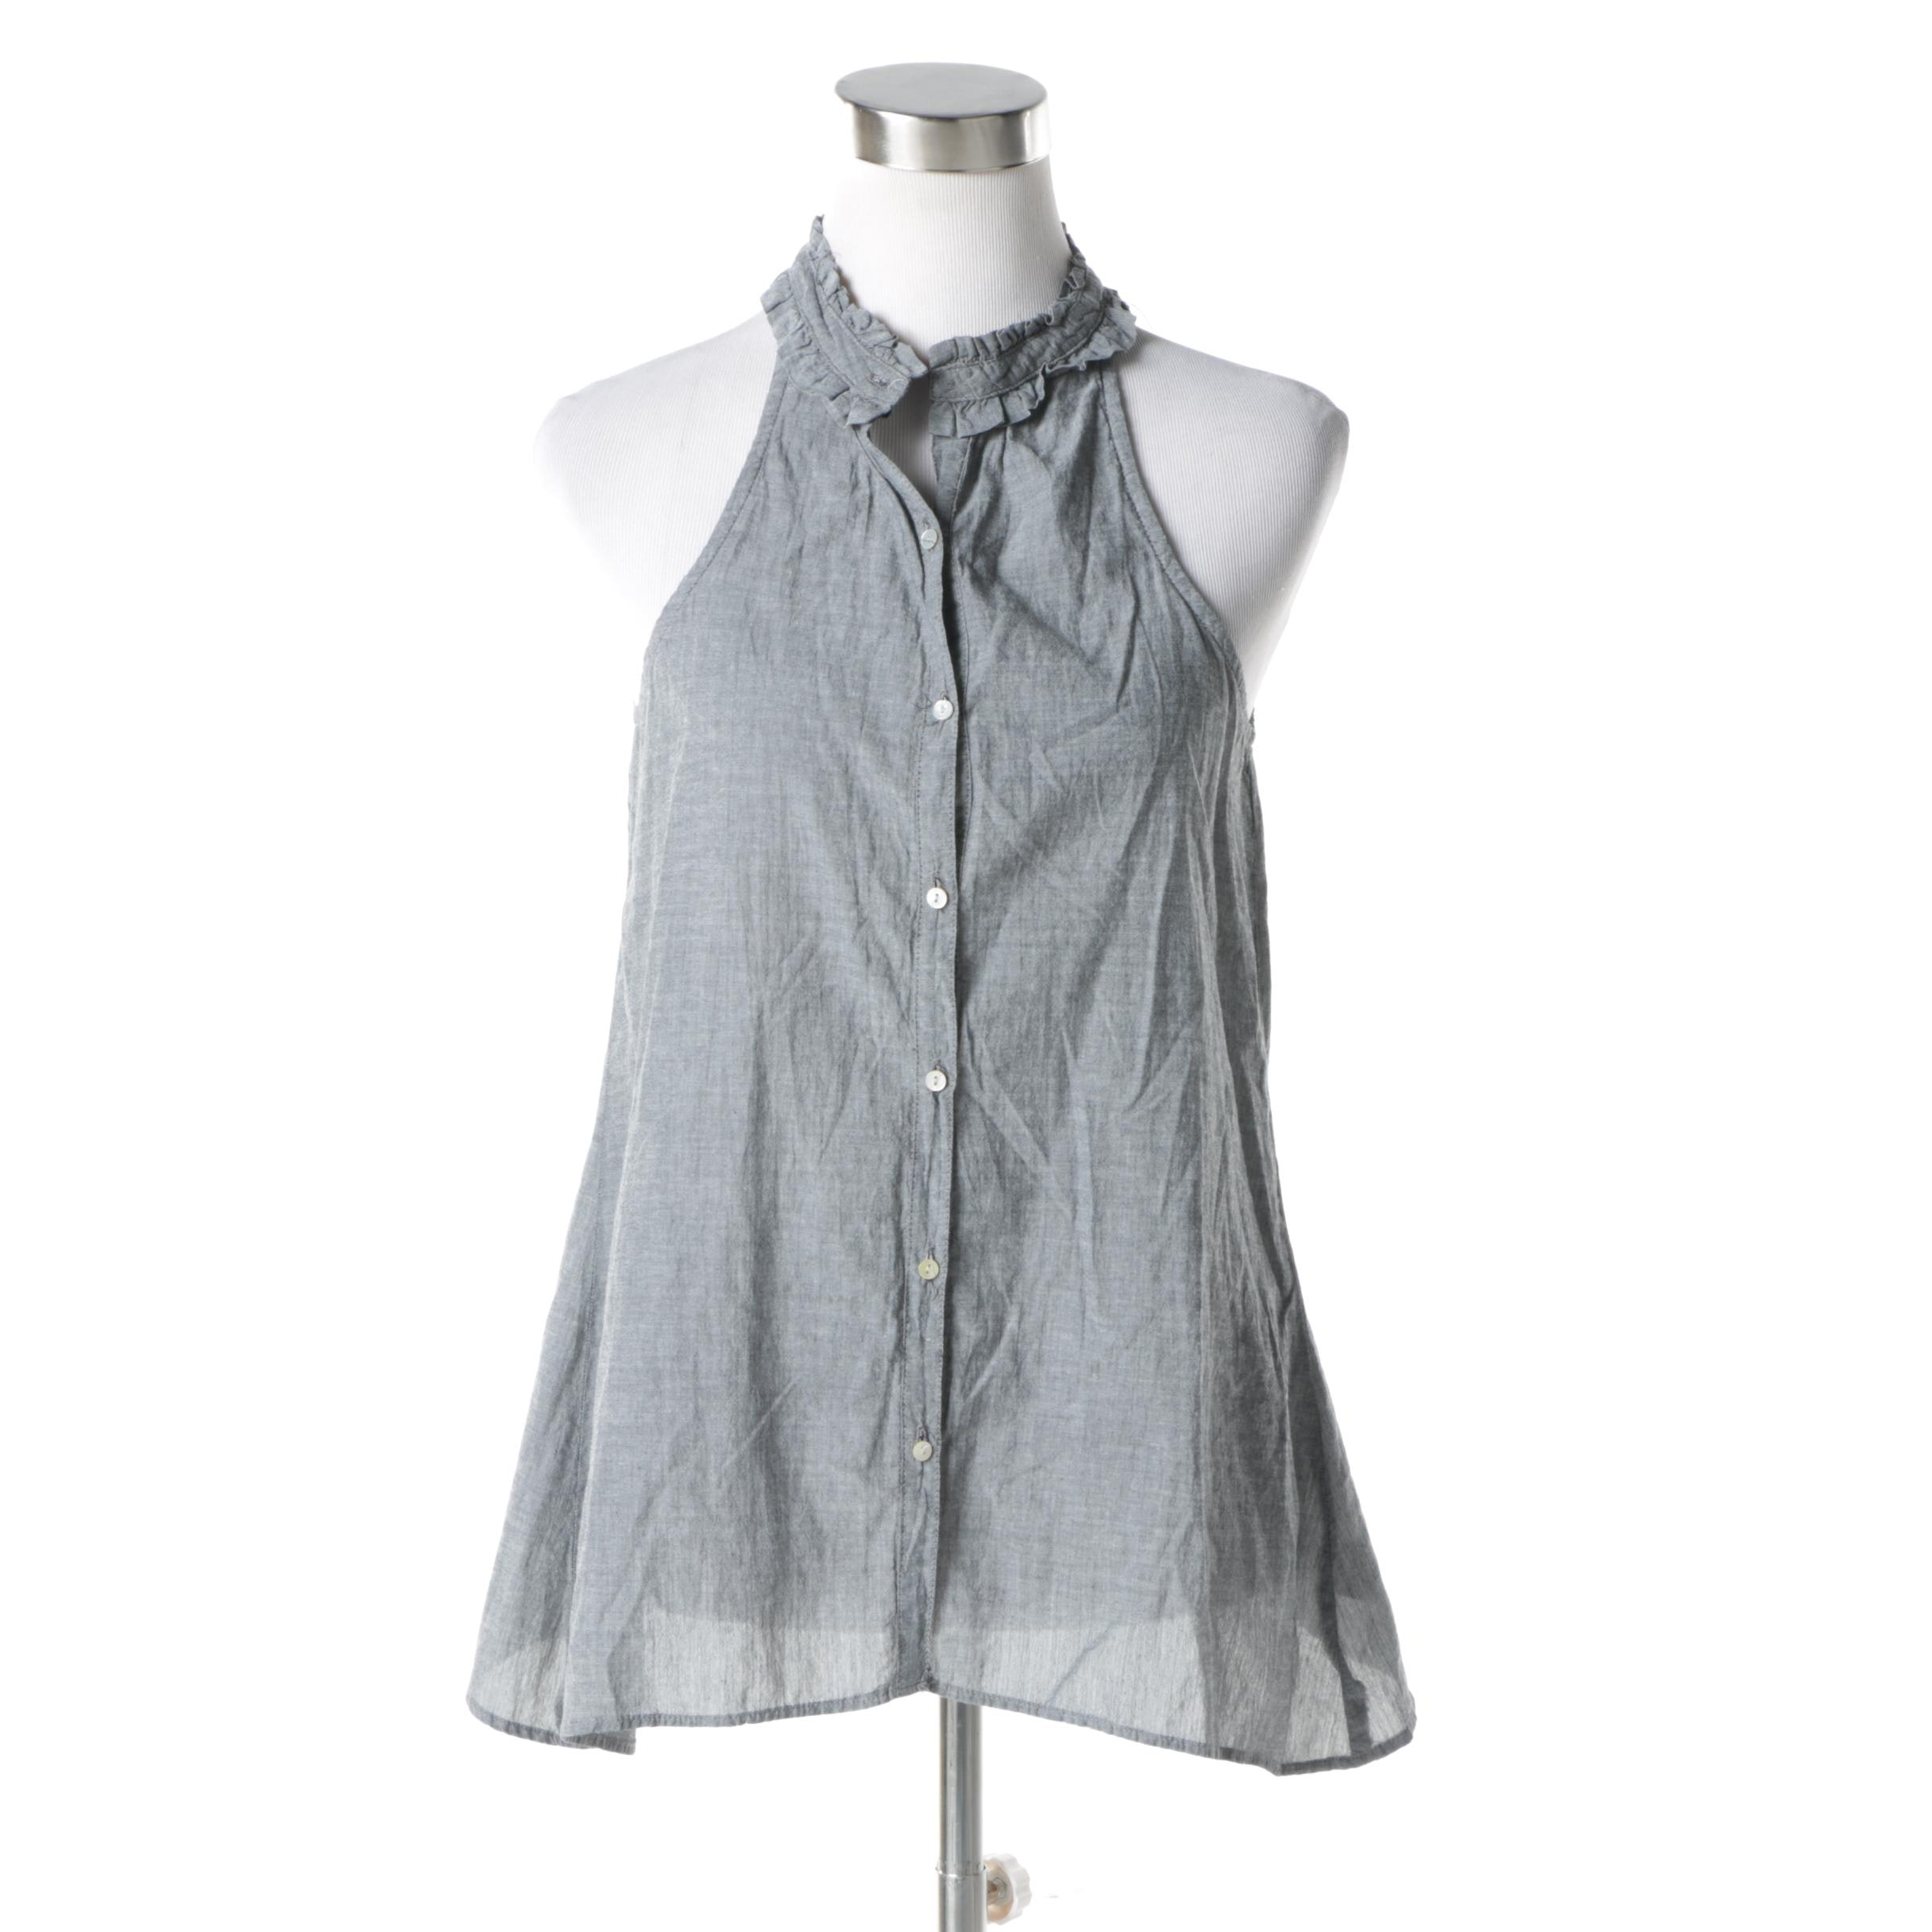 Women's Ella Moss Sleeveless Cotton Top